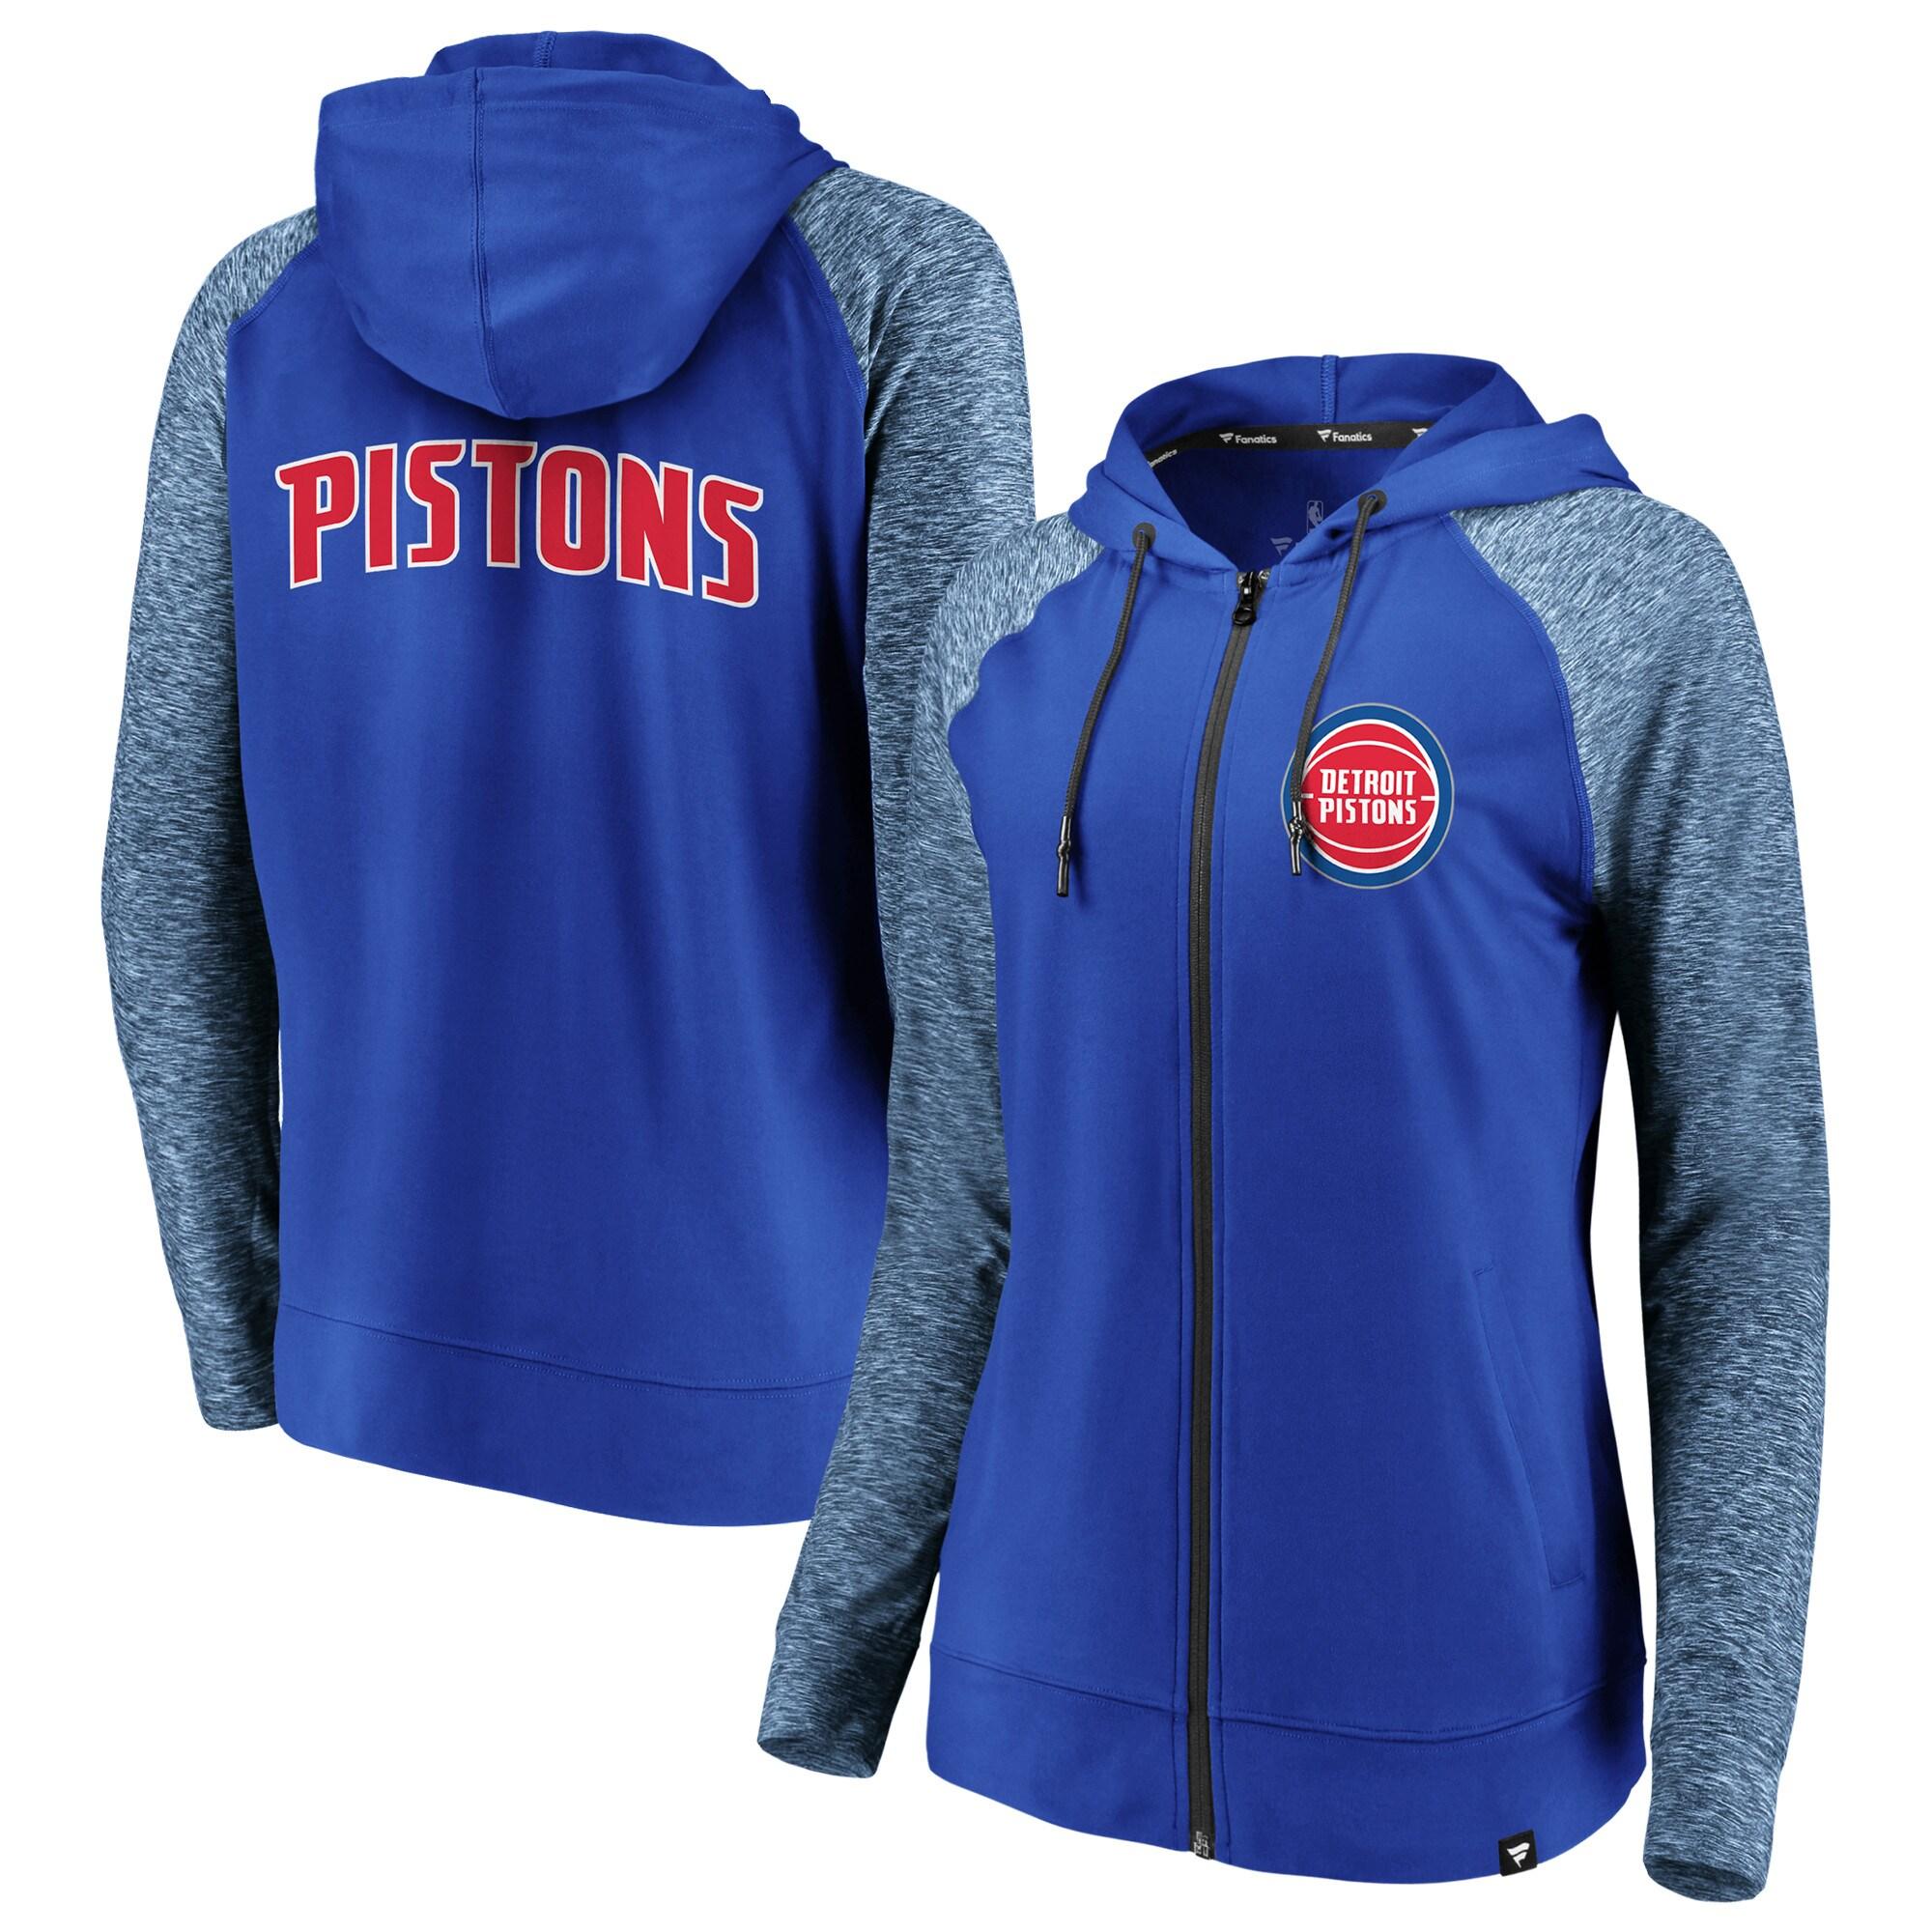 Detroit Pistons Fanatics Branded Women's Made to Move Static Raglan Performance Full-Zip Hoodie - Blue/Heathered Blue